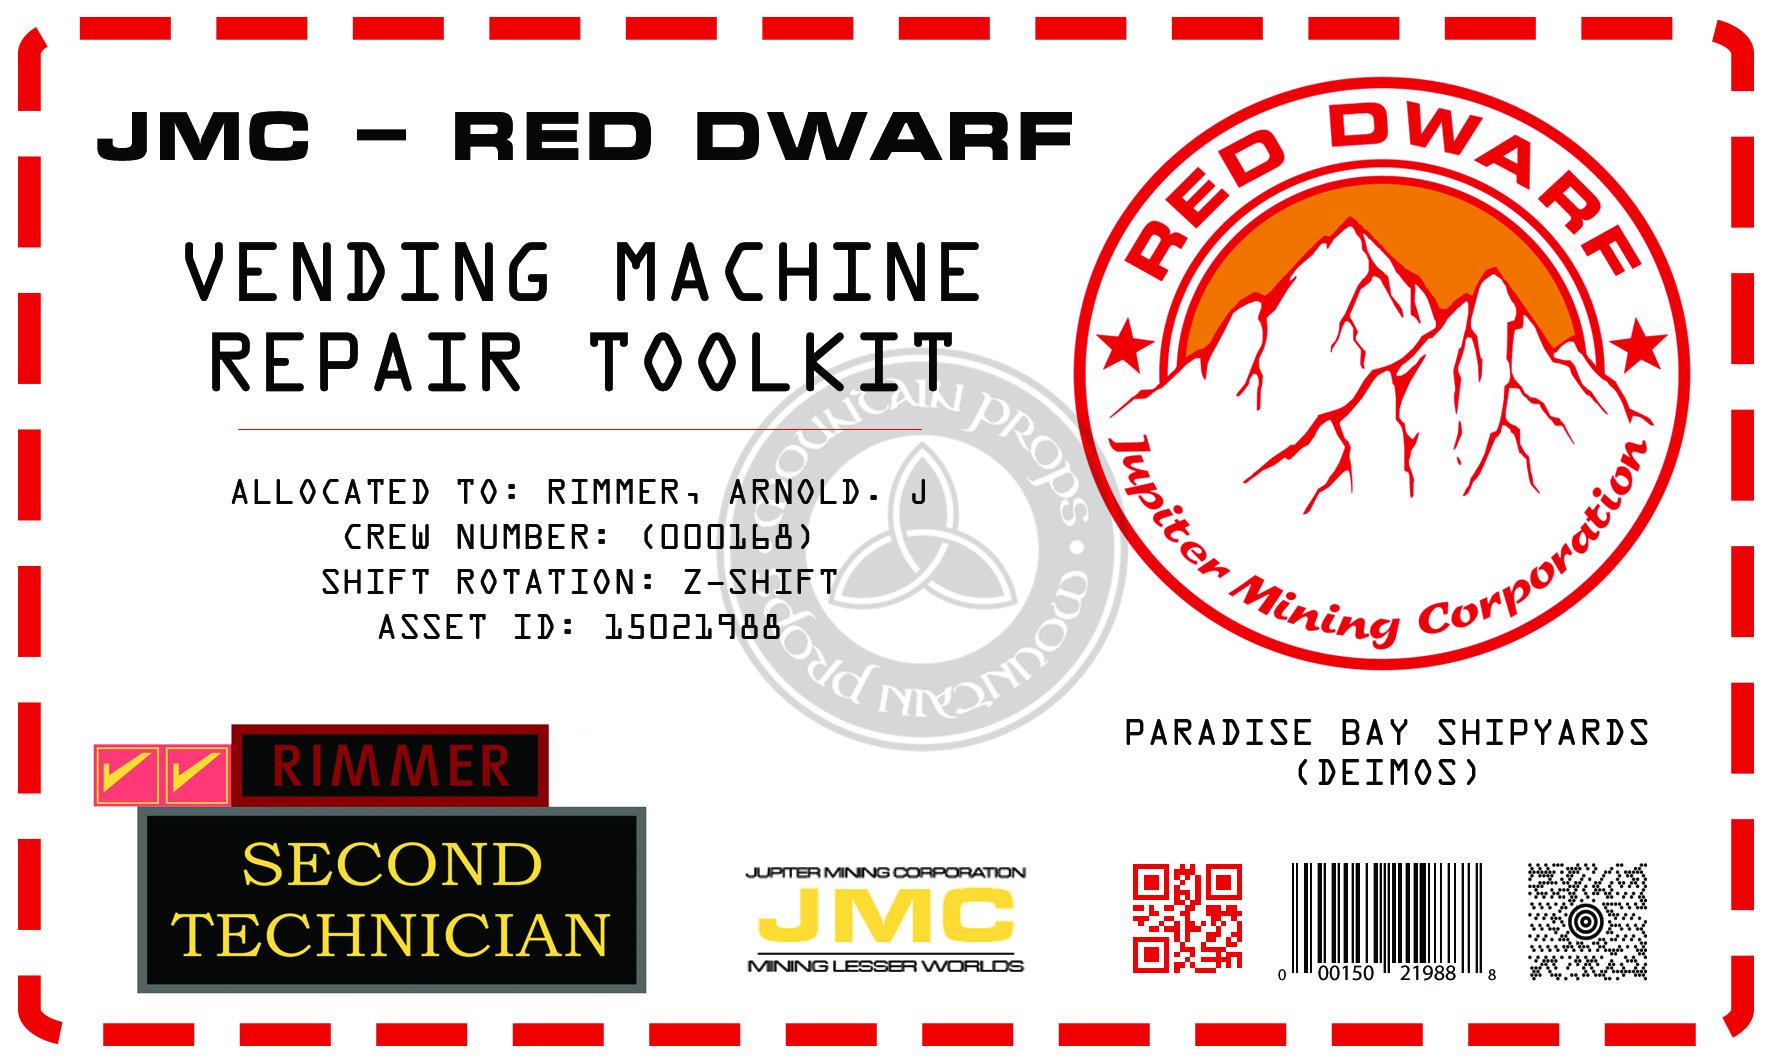 Red Dwarf Vending Machine repair kit sticker | RPF Costume and Prop